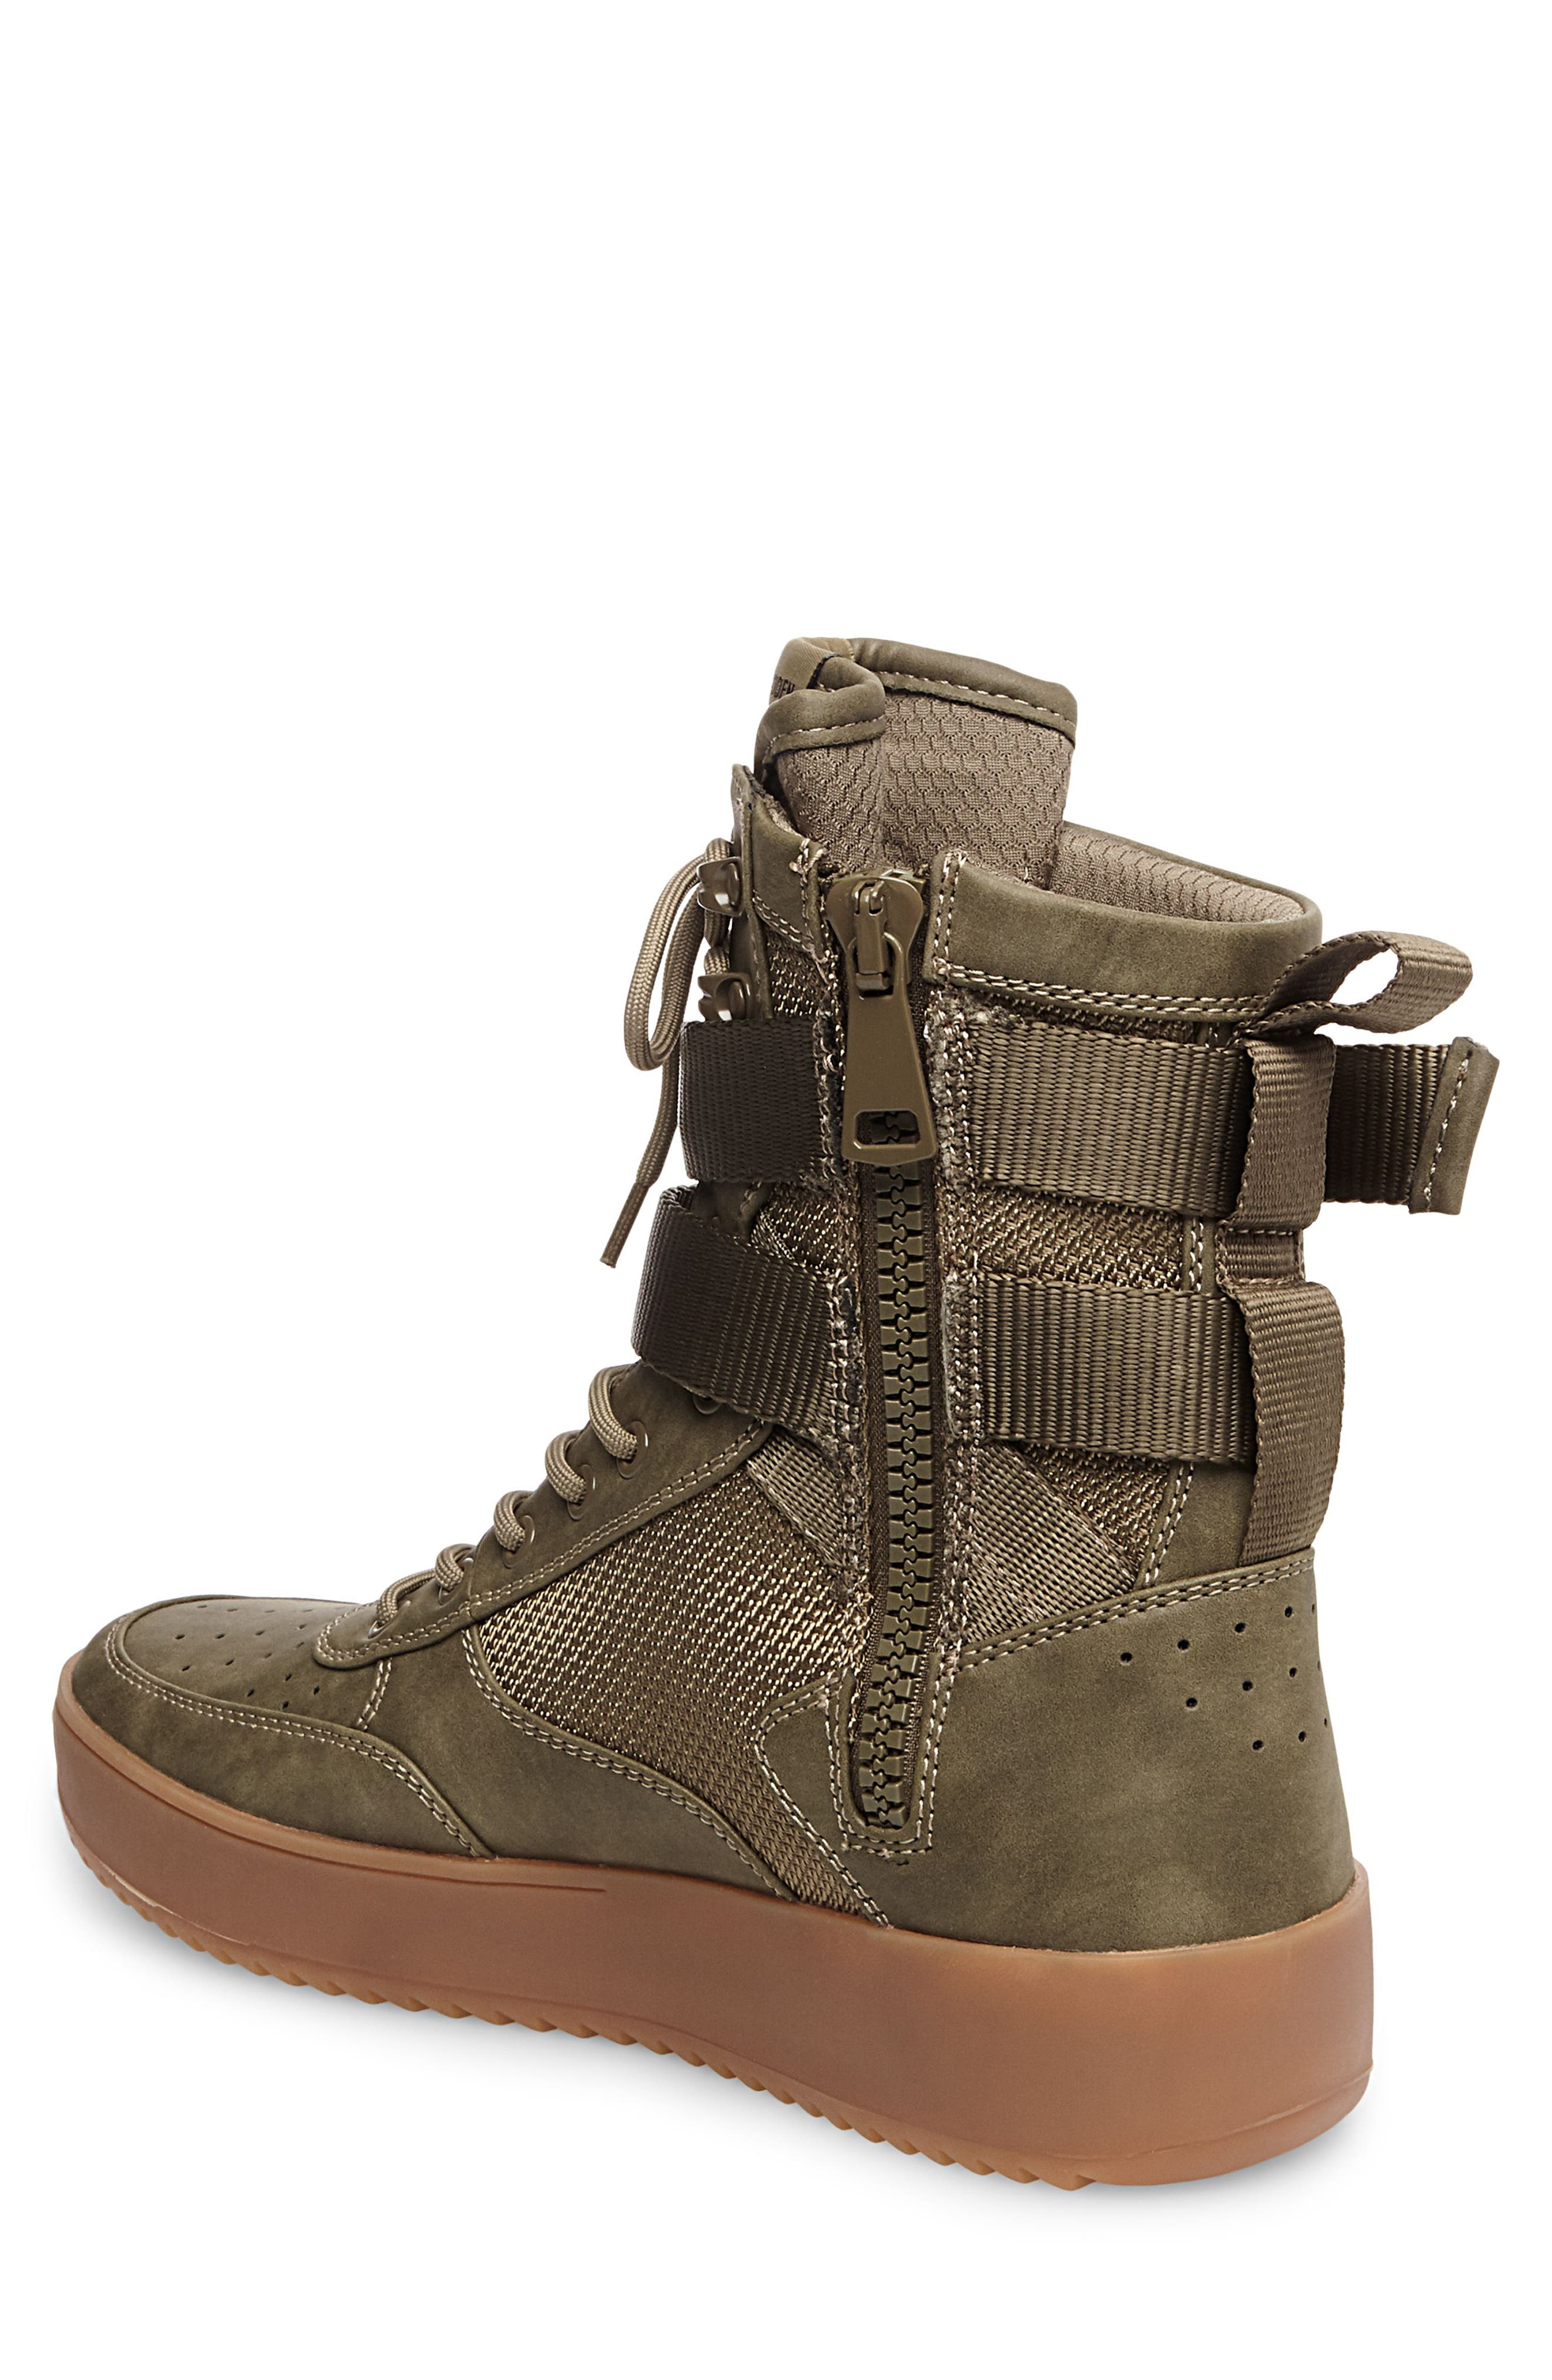 Zeroday Sneaker,                             Alternate thumbnail 6, color,